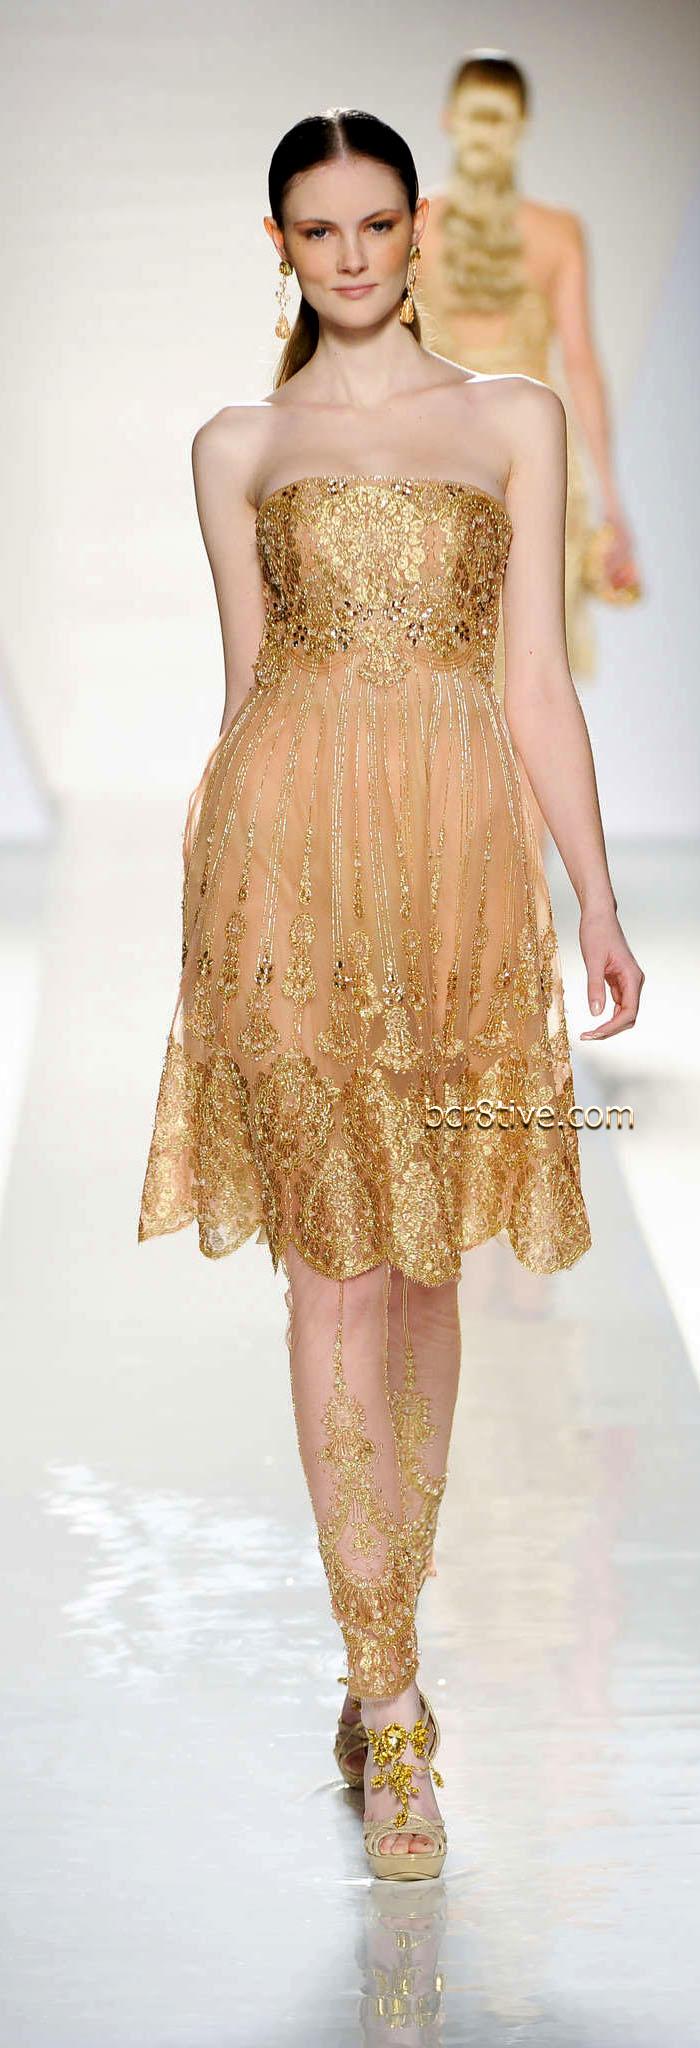 Fausto Sarli Spring Summer 2012 Couture